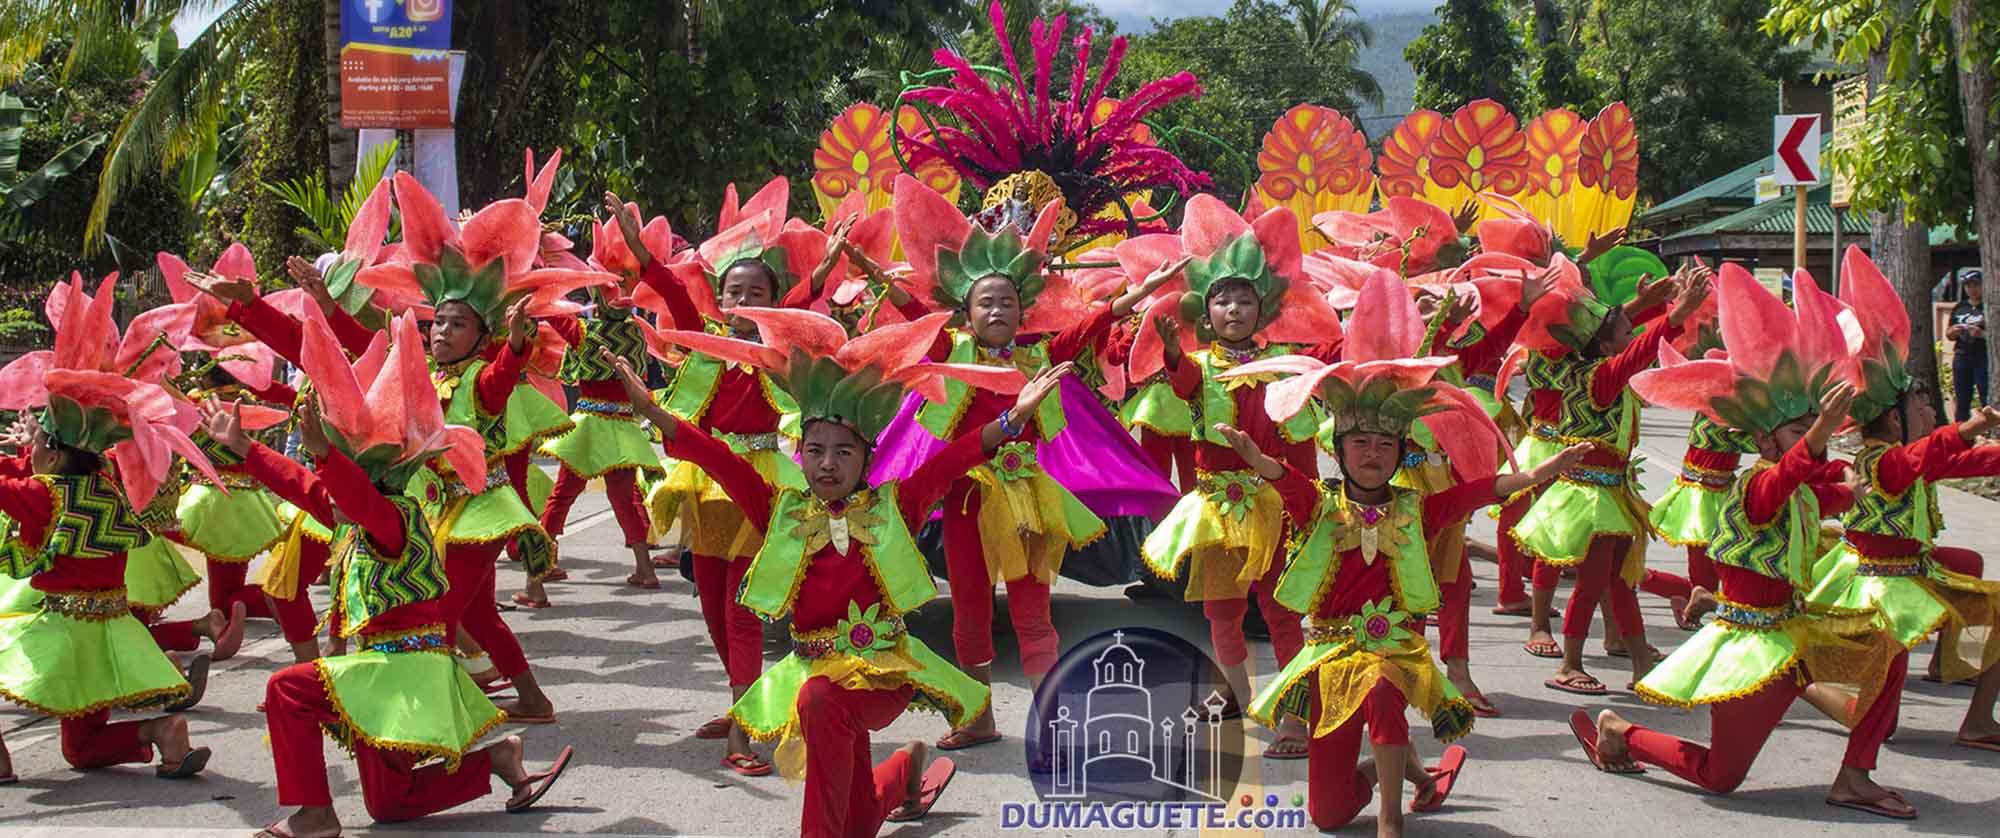 Sinulog Festival 2020 in Jimalalud - Negros Oriental